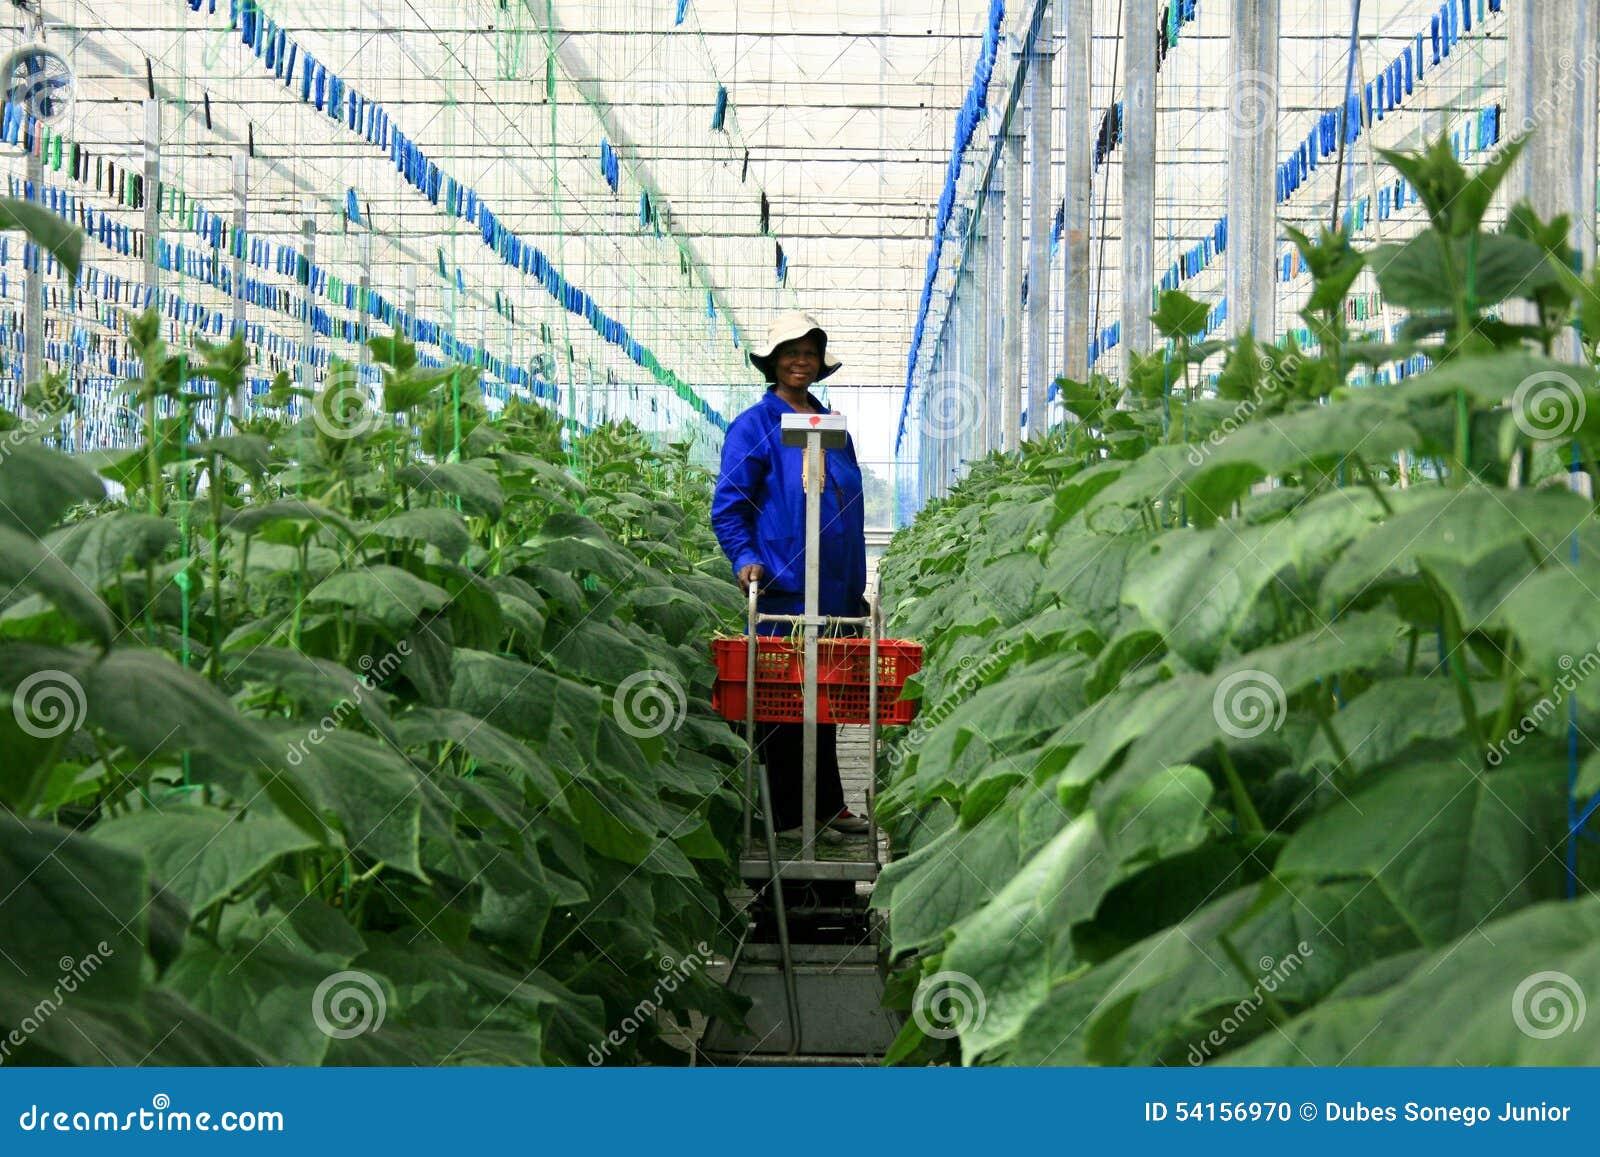 Greenhouse cucumber plantation